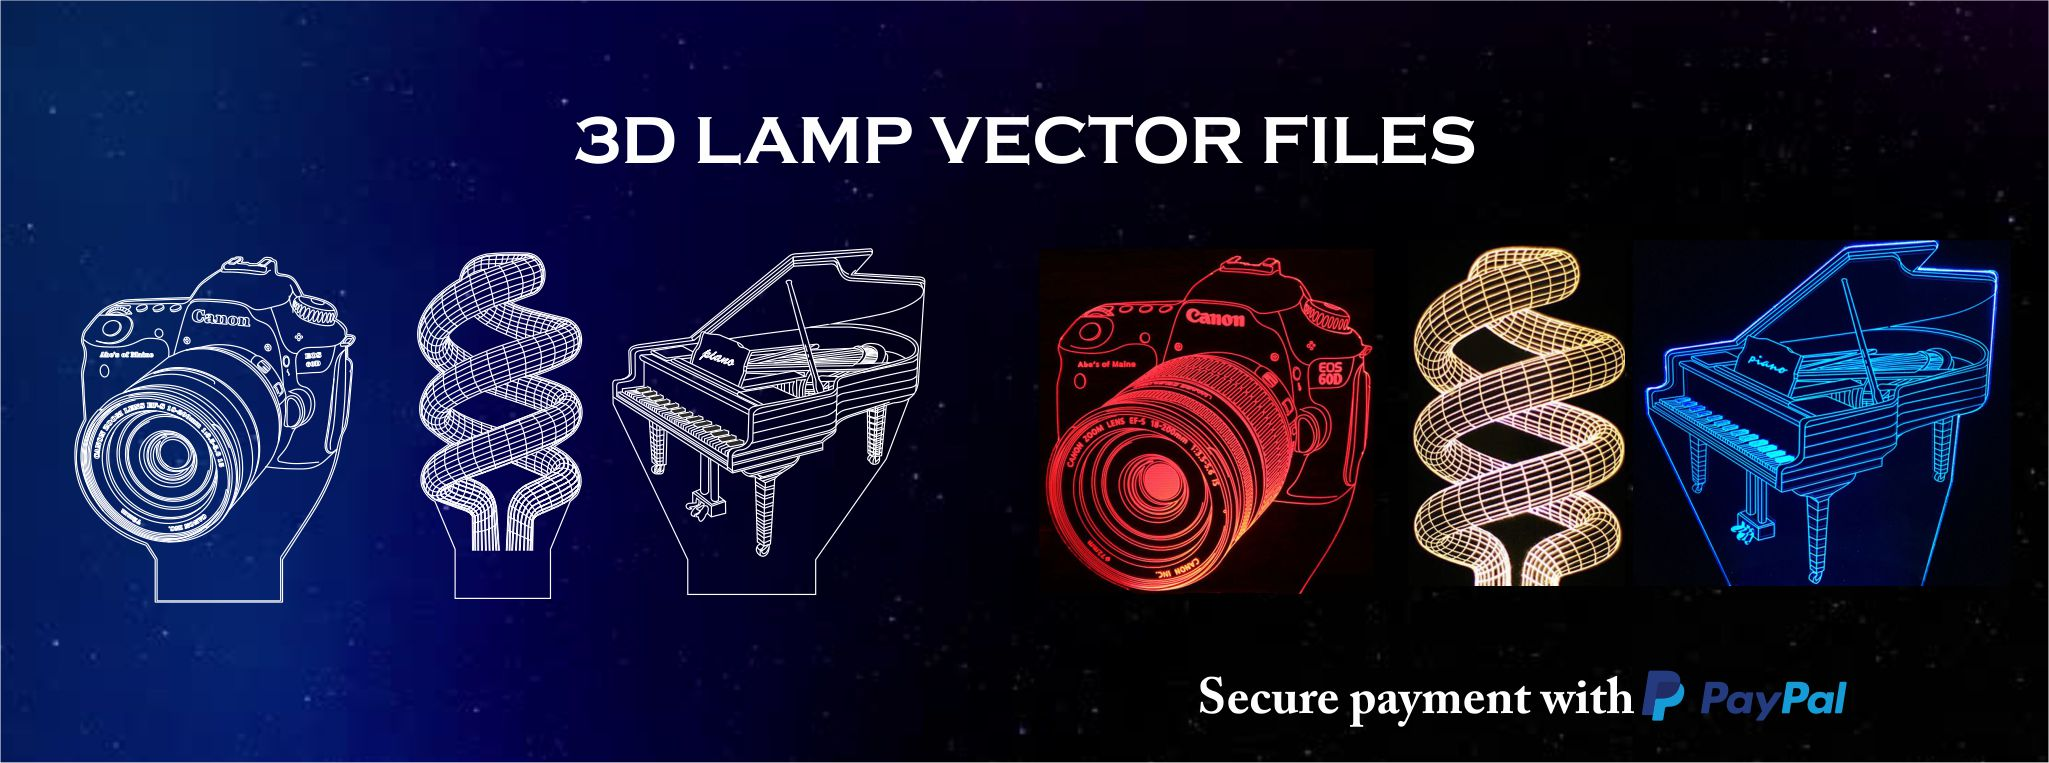 2049x763 3d Lamp Designs Amp 3d Illusion Lamp Plan Vector File Amp 3d Illusion